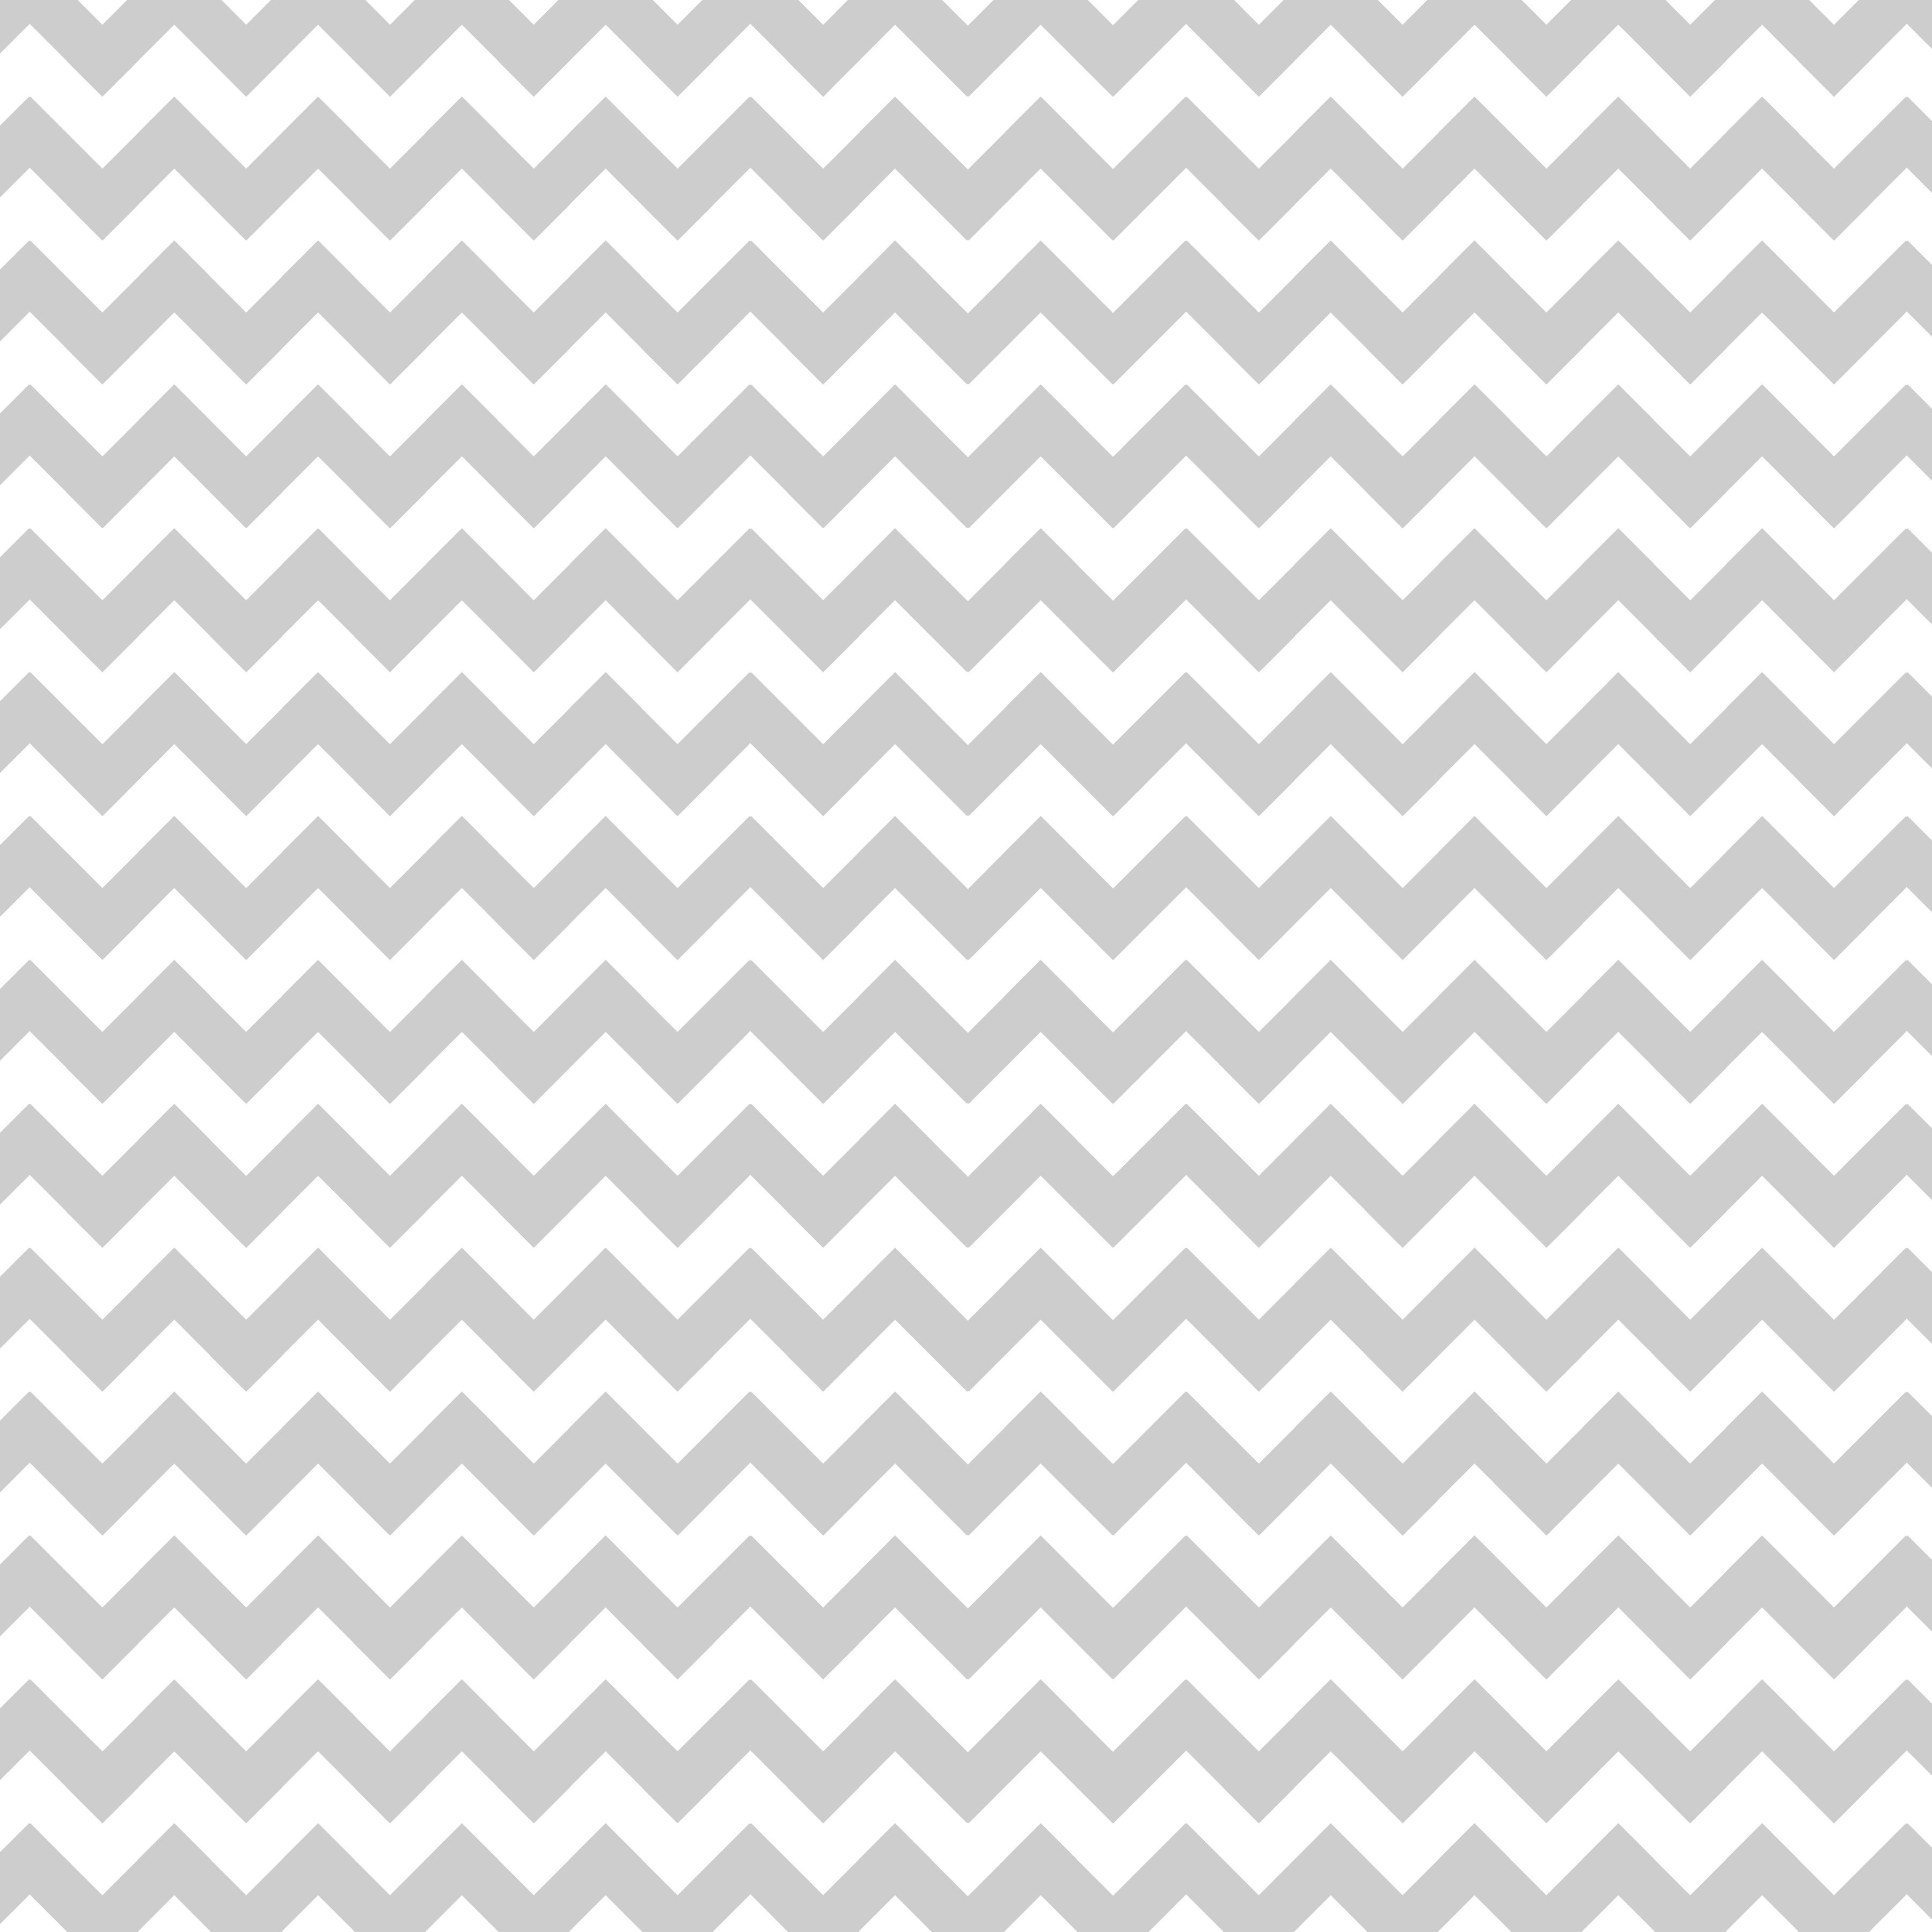 Chevron clipart printable. Free gray cliparts download